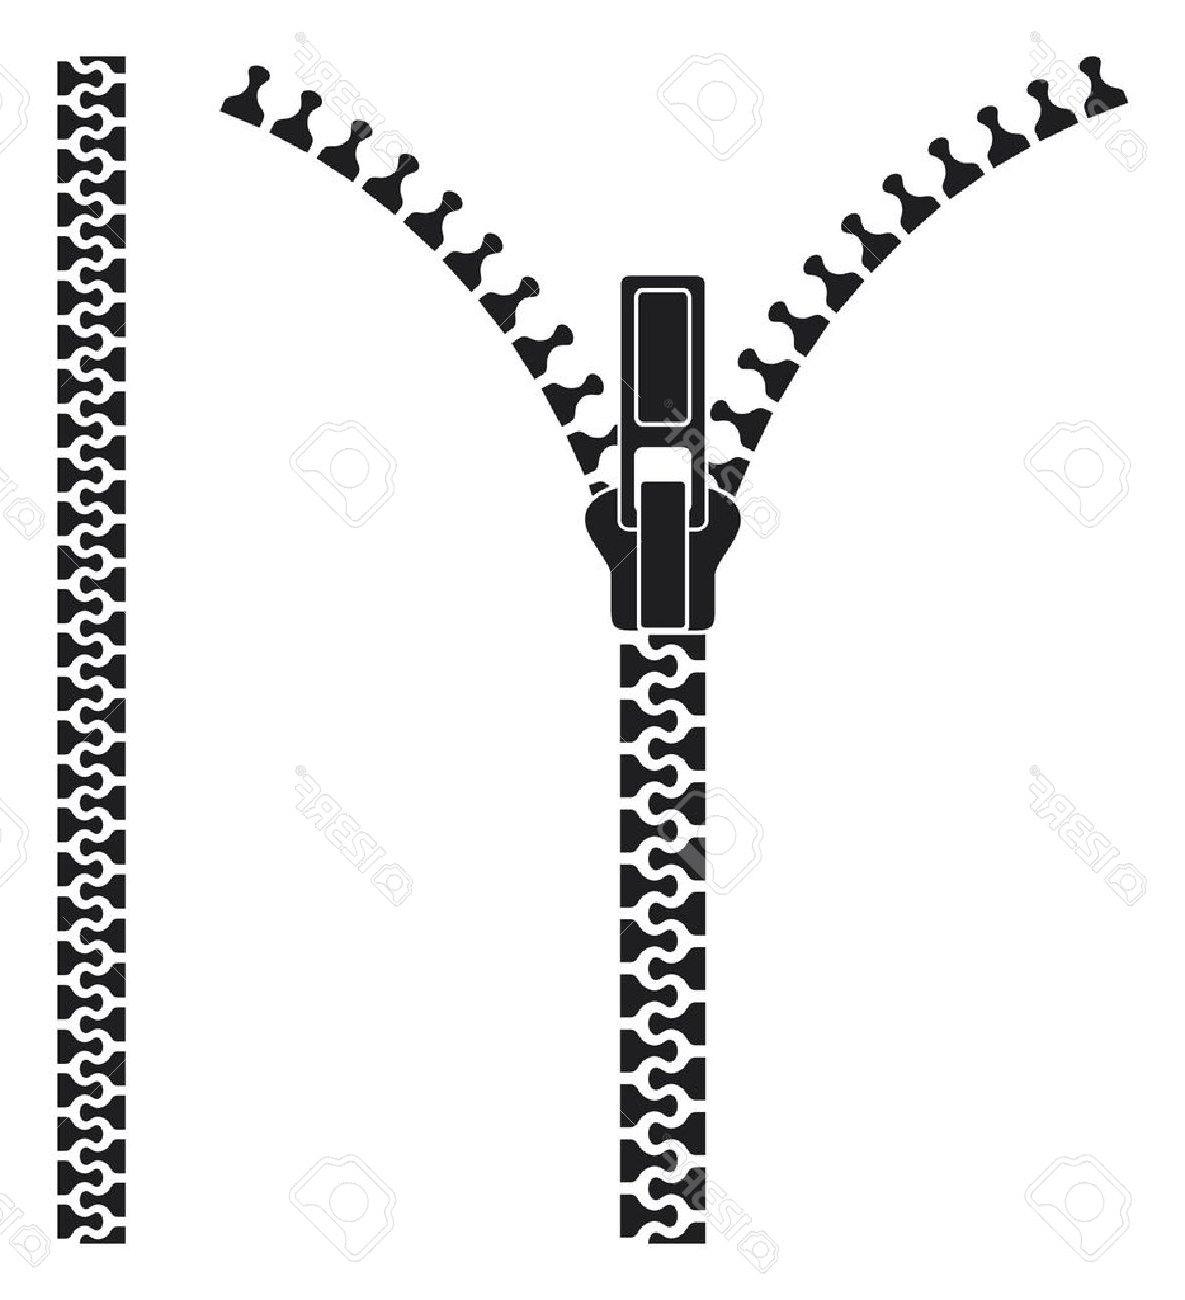 Zipper Clipart black and white 6.